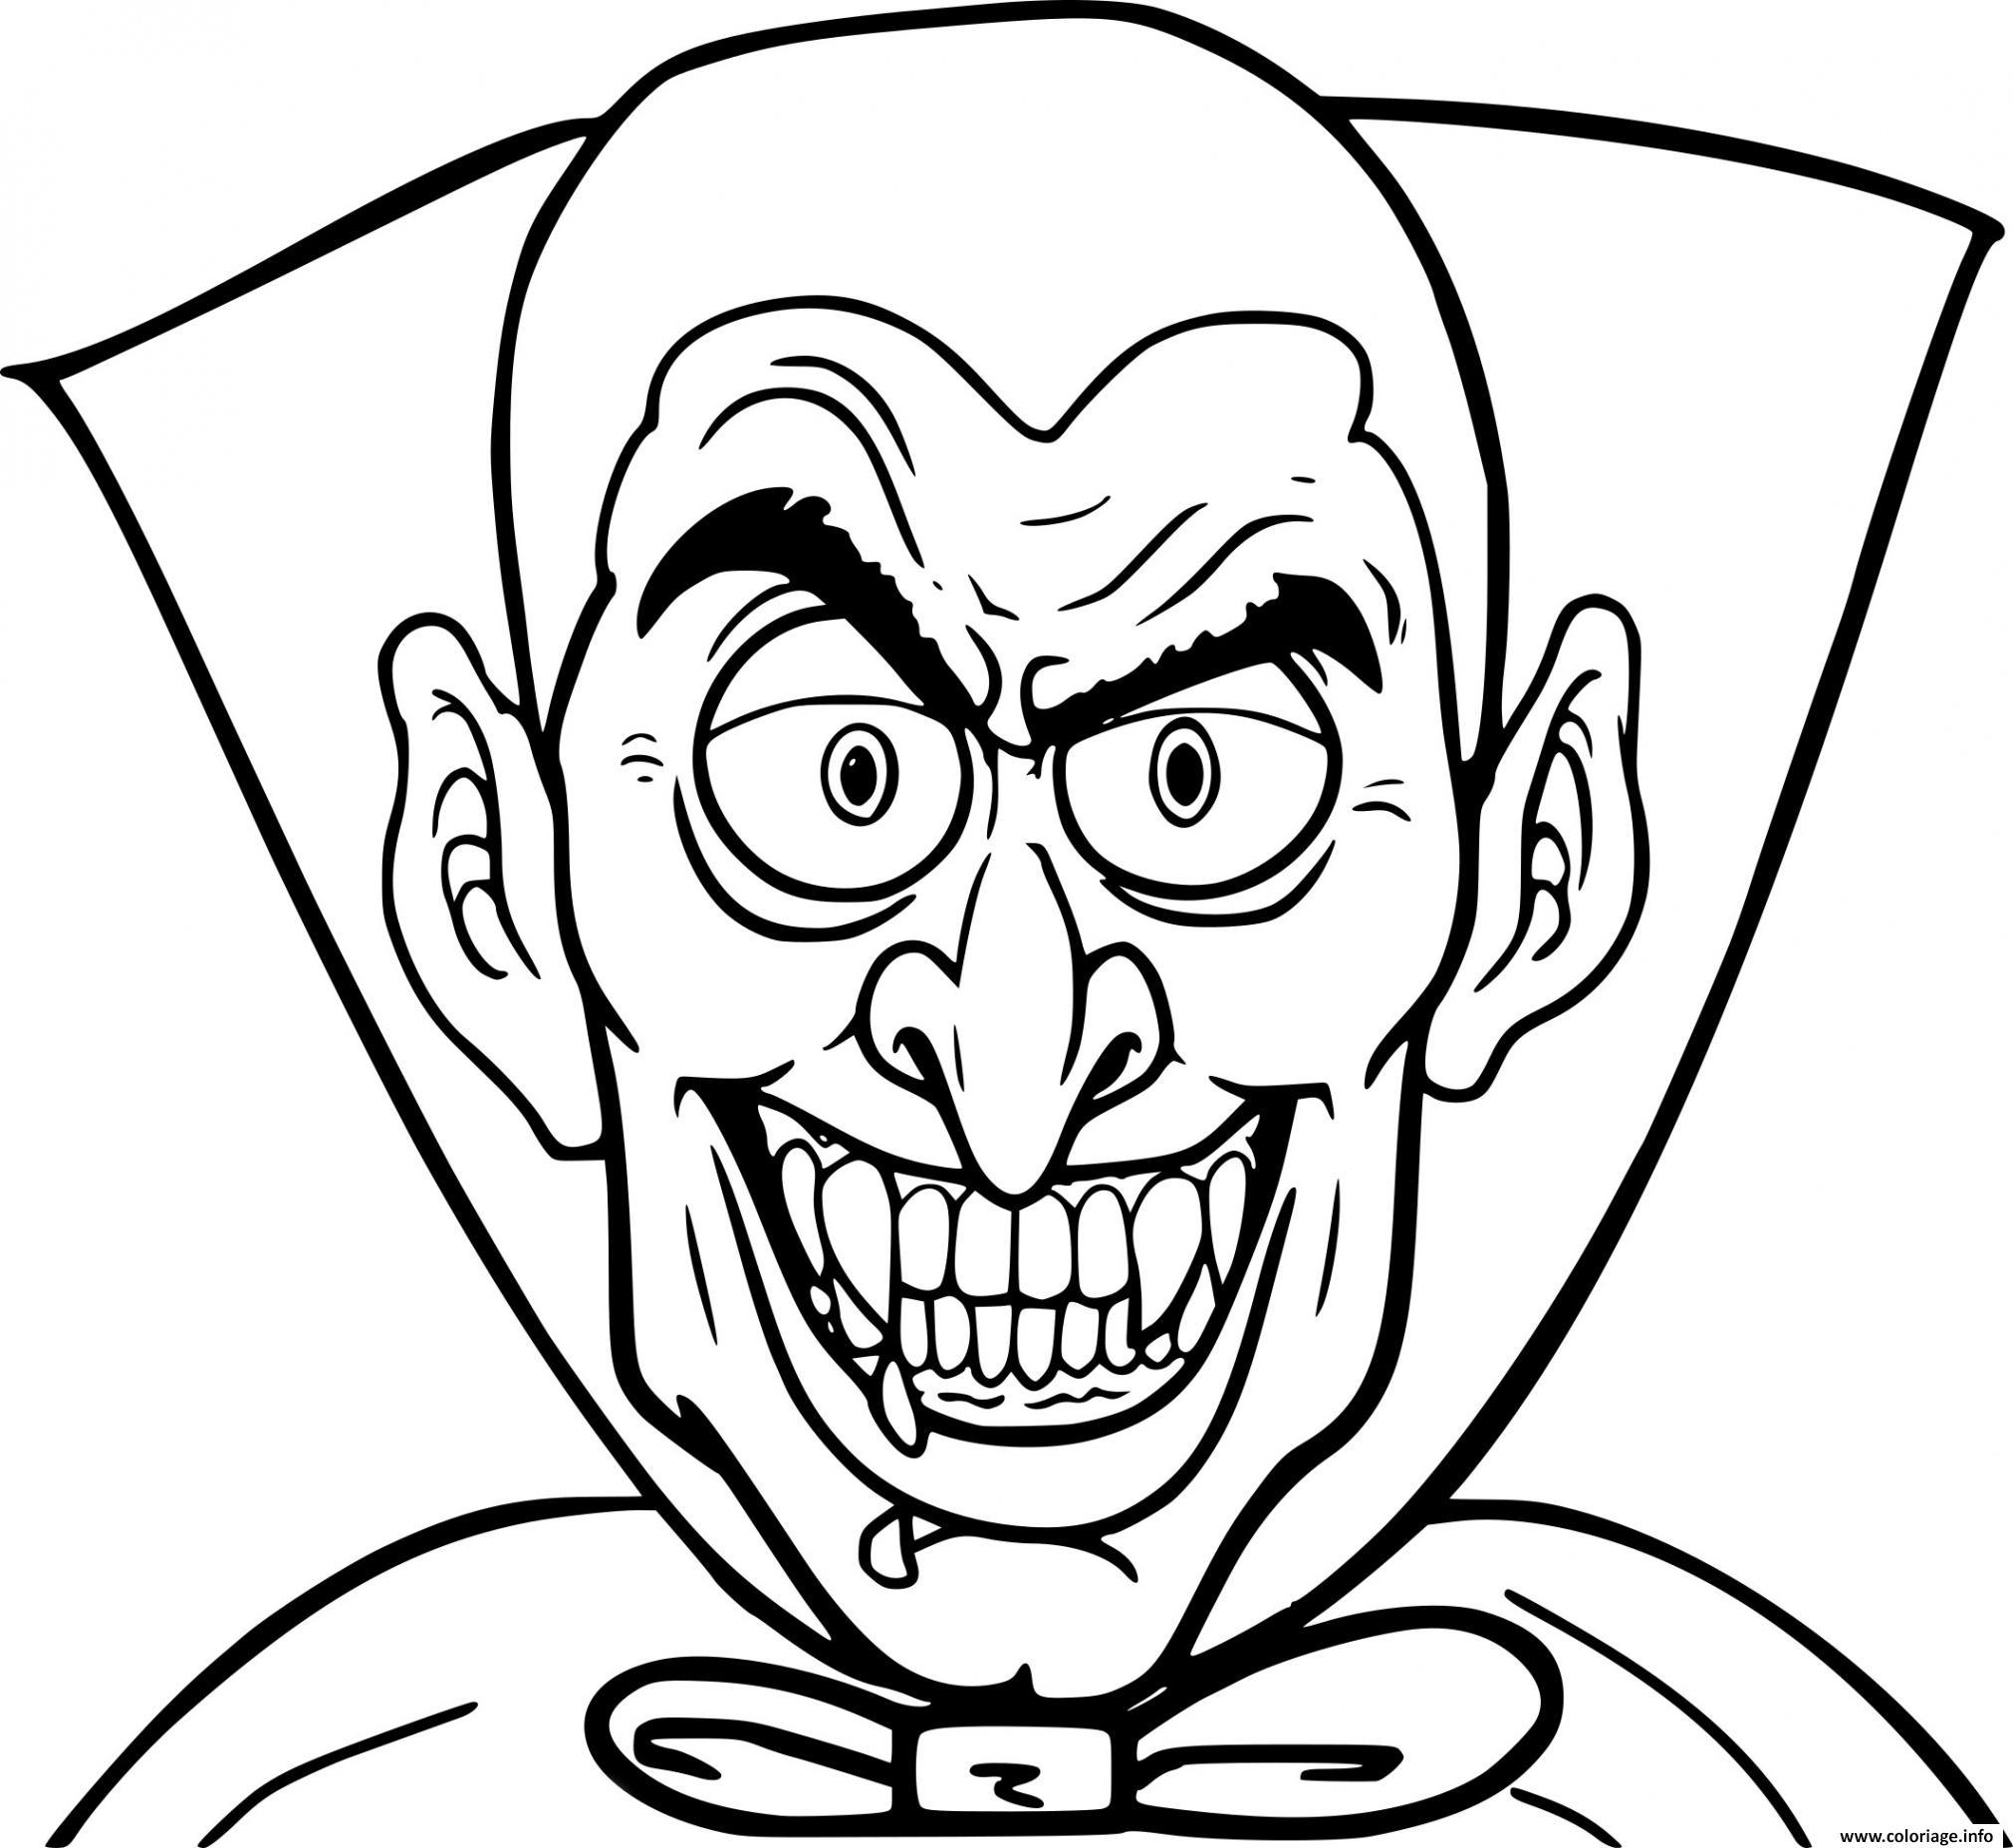 Dessin halloween vampire qui fait peur Coloriage Gratuit à Imprimer